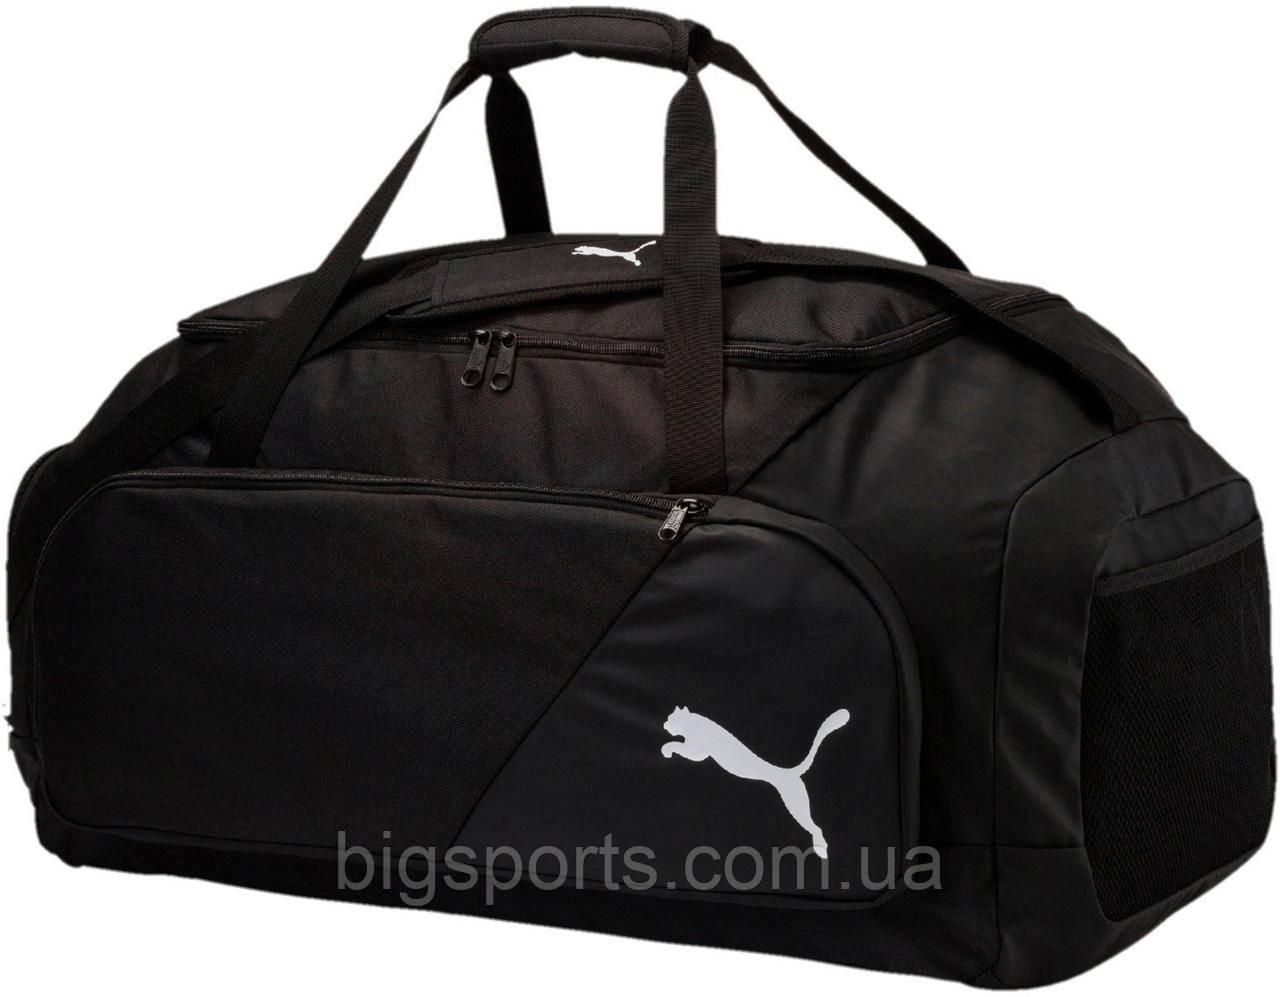 Сумка Puma Liga Large Bag (арт. 07520801)